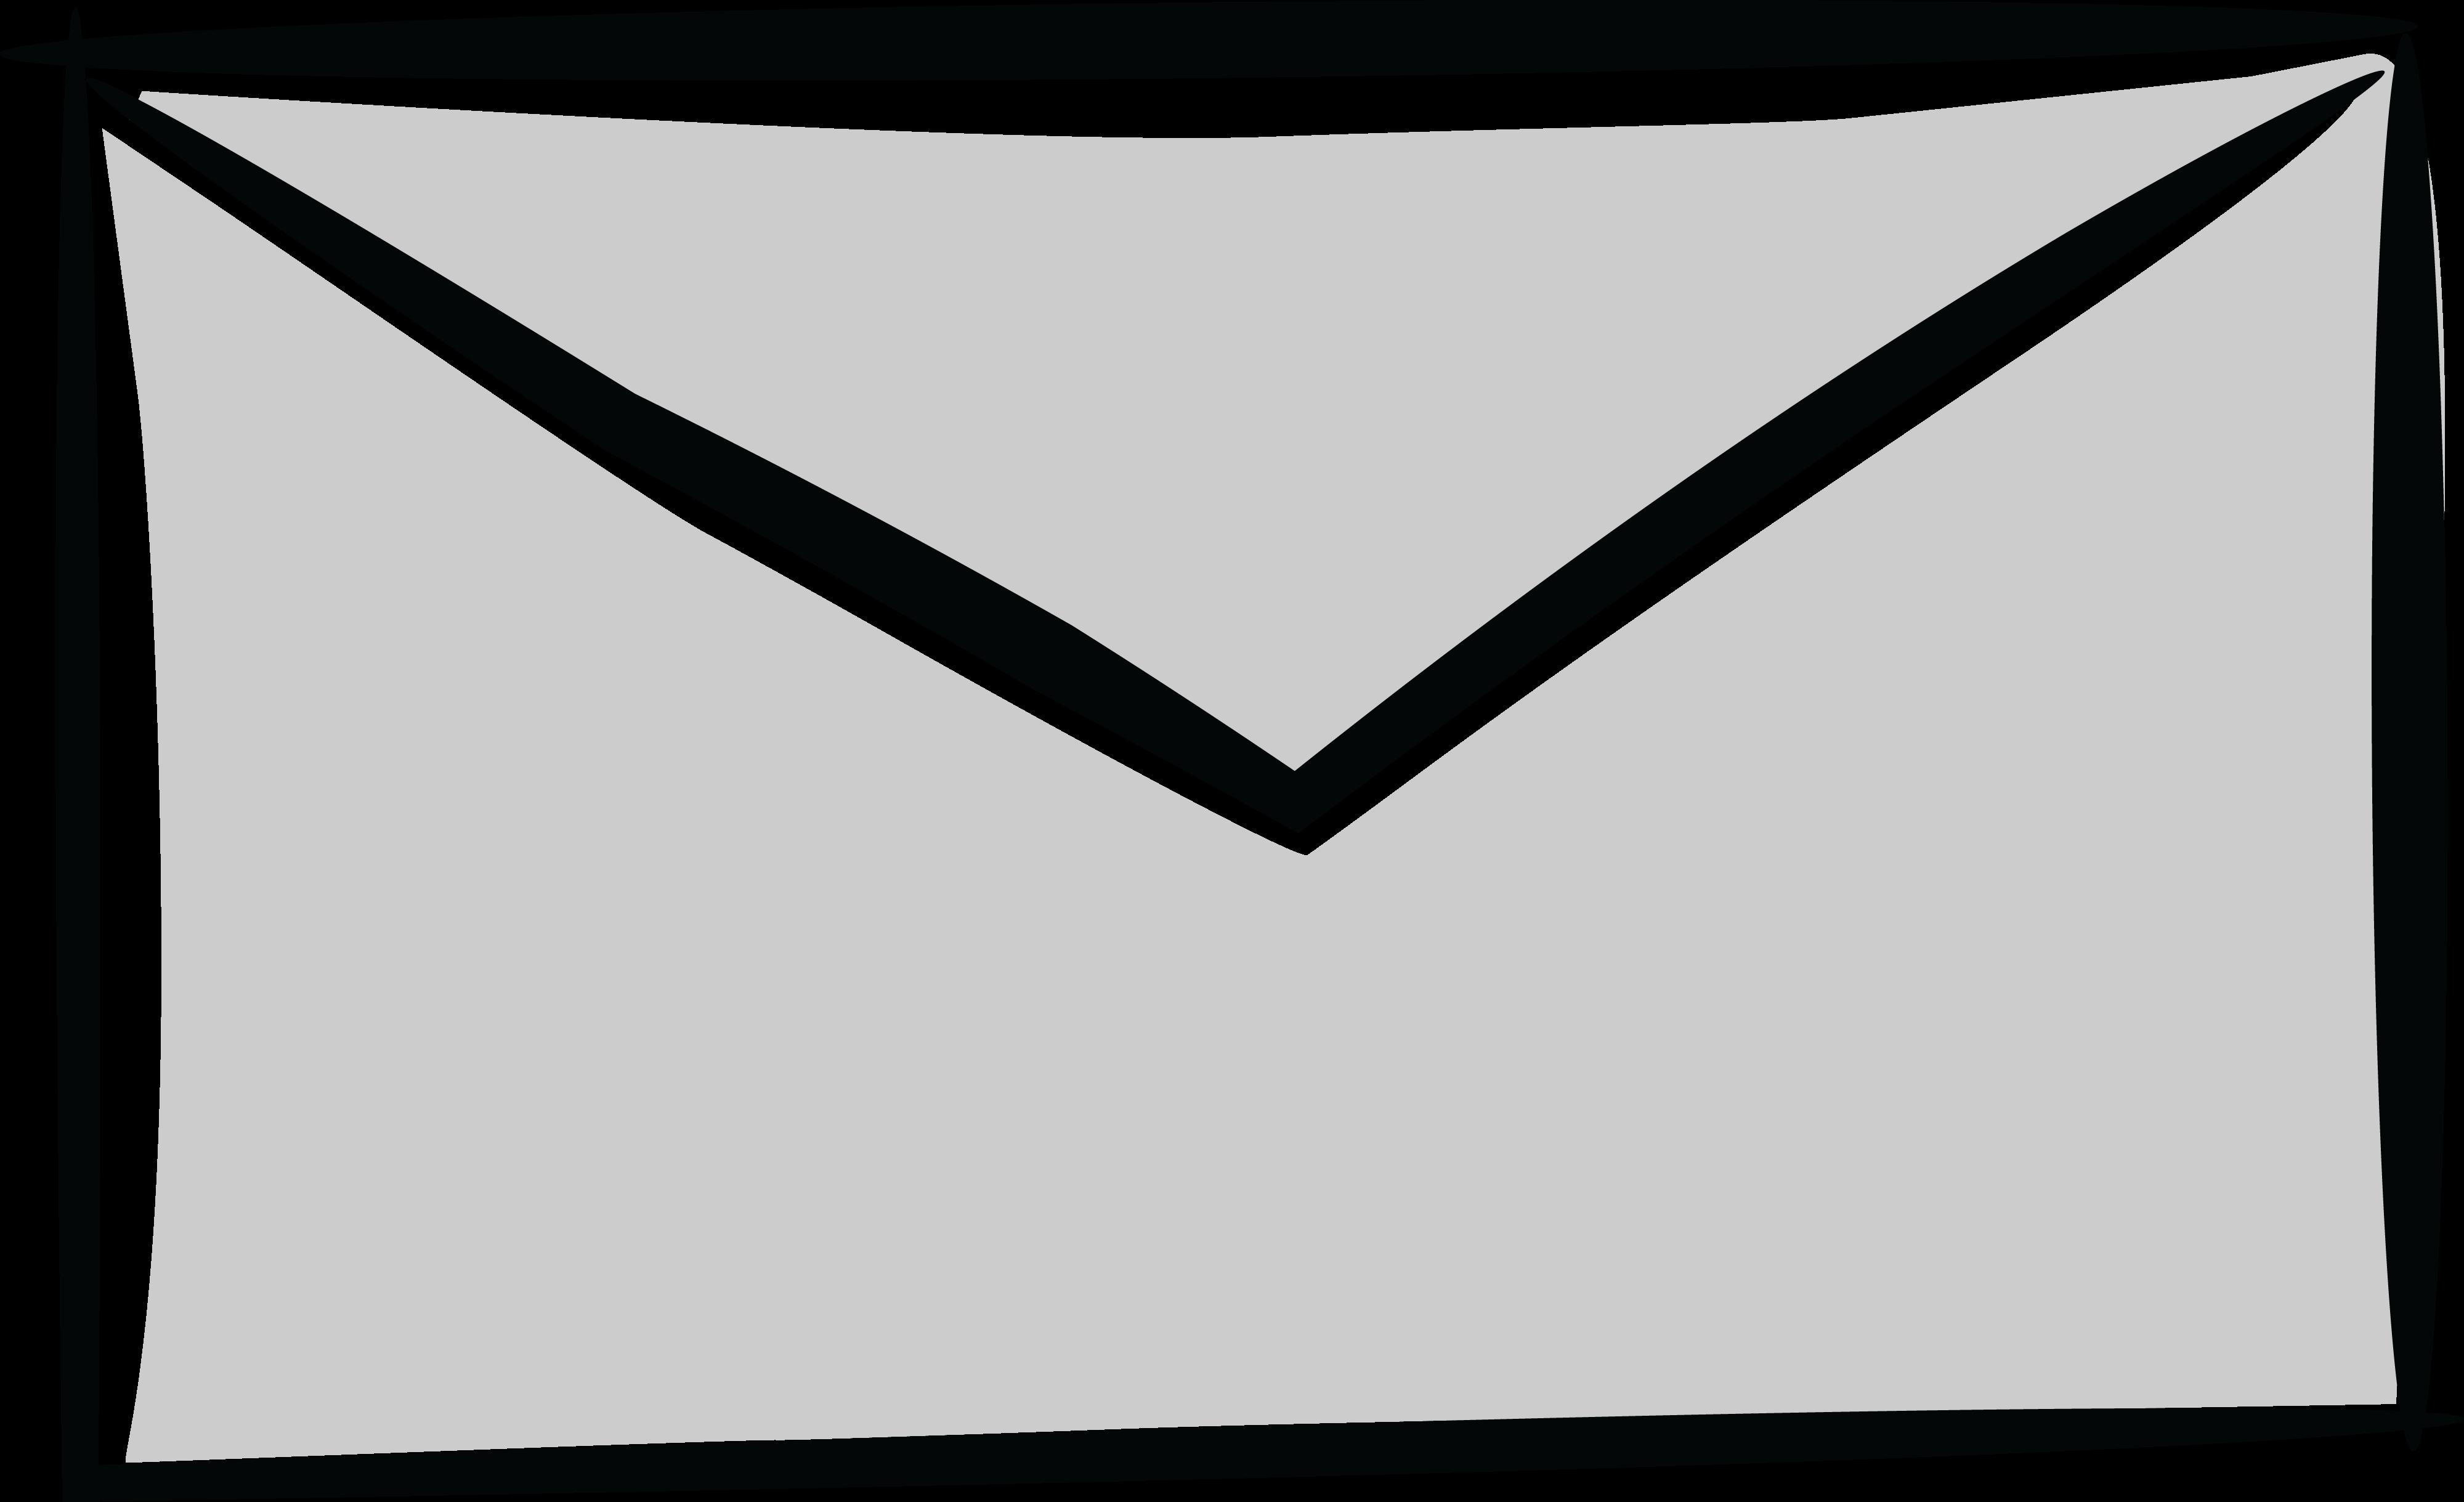 Картинка письма для презентации